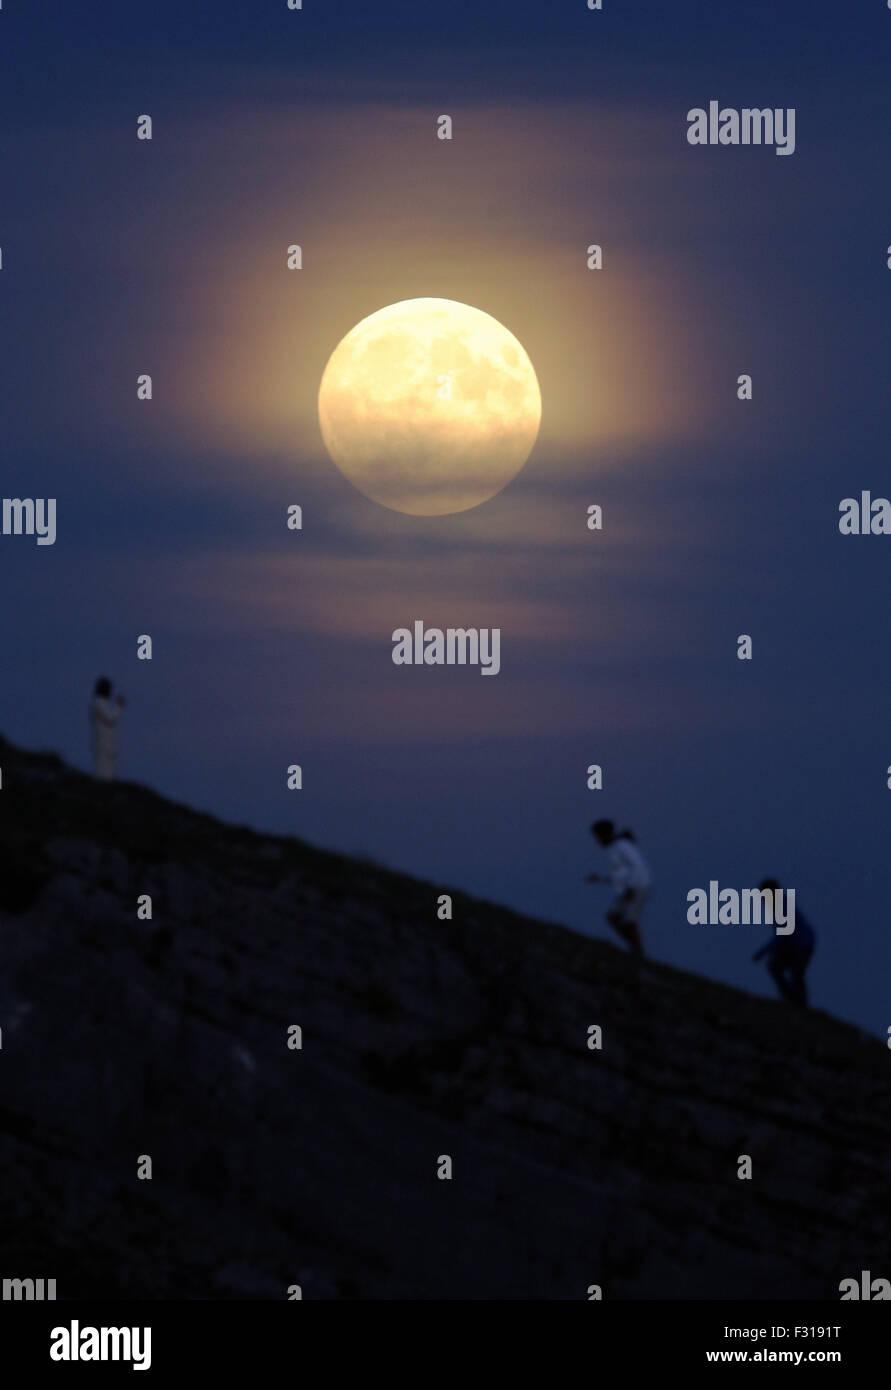 Mumbles UK. Sunday 27 September 2015   A full moon rises over Bracelet Bay, Mumbles in Swansea Bay, Wales UK. The - Stock Image